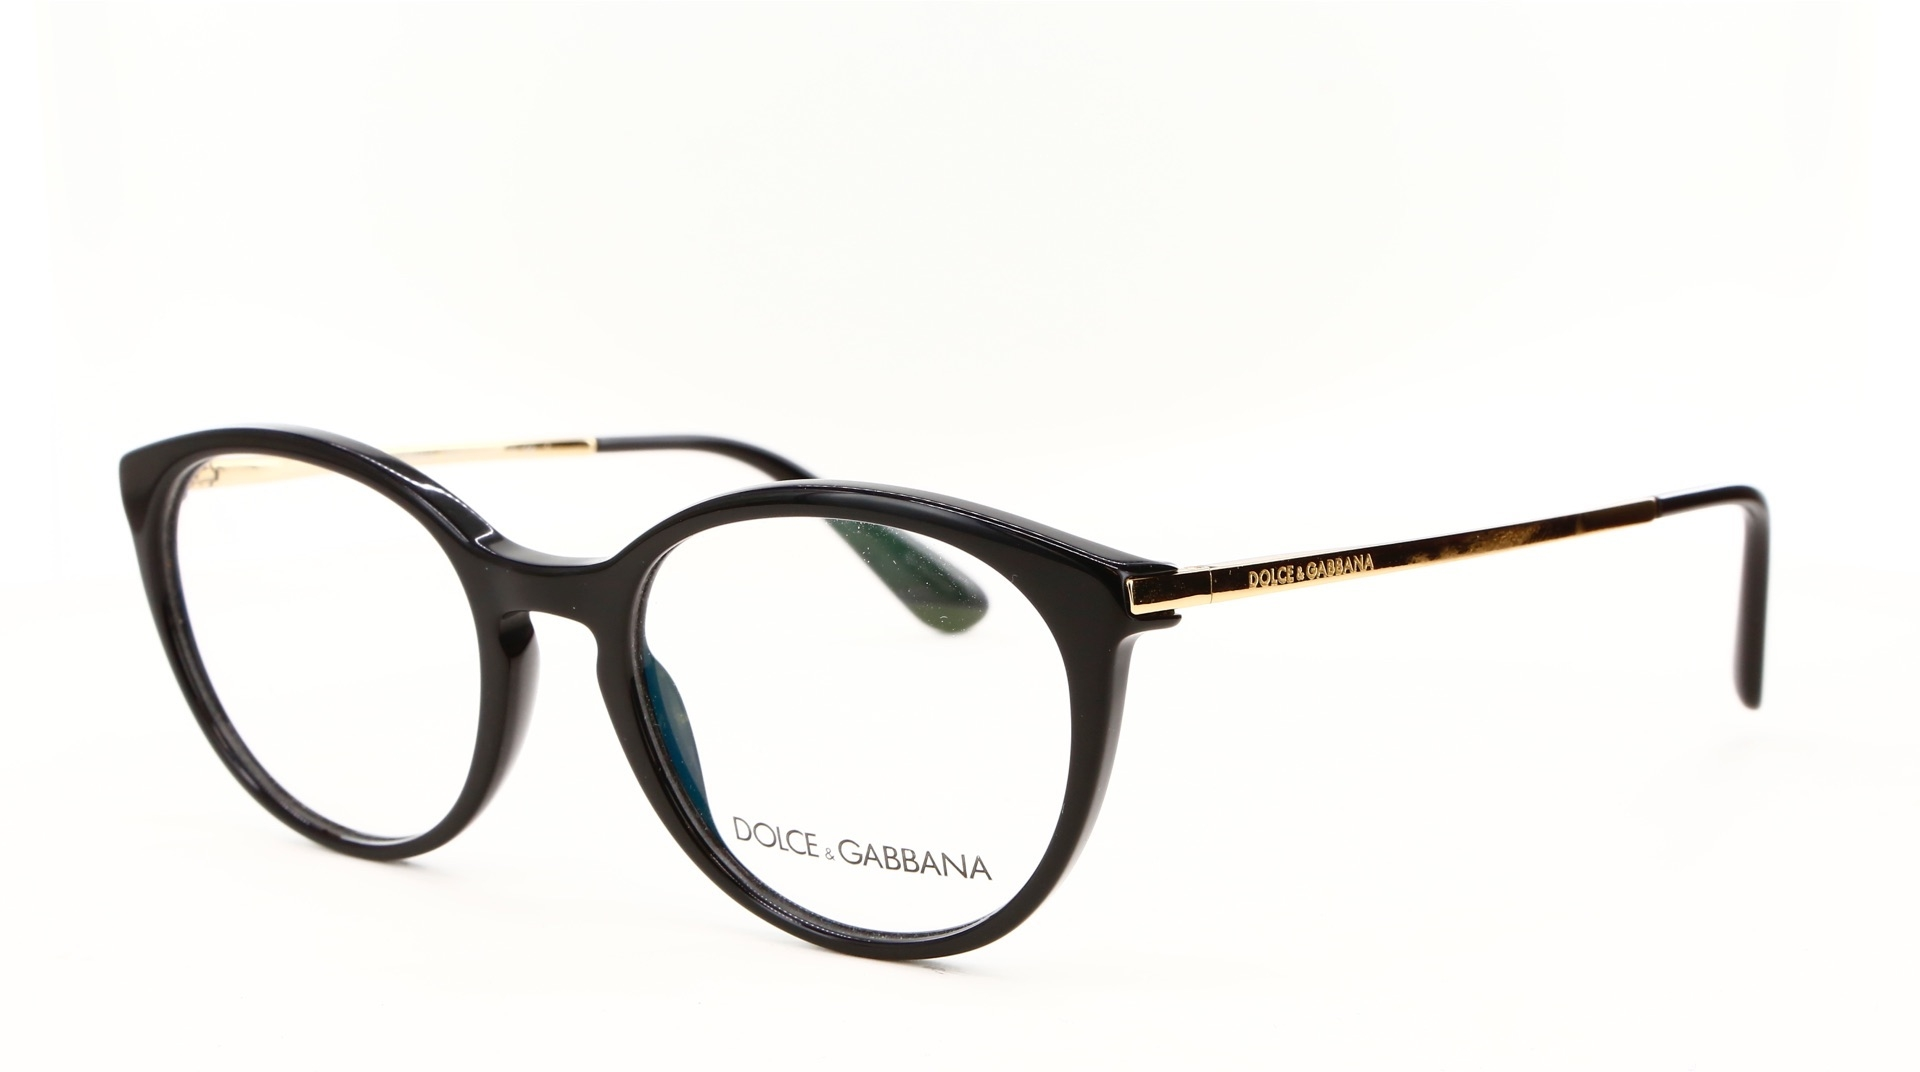 Dolce & Gabbana - ref: 78609